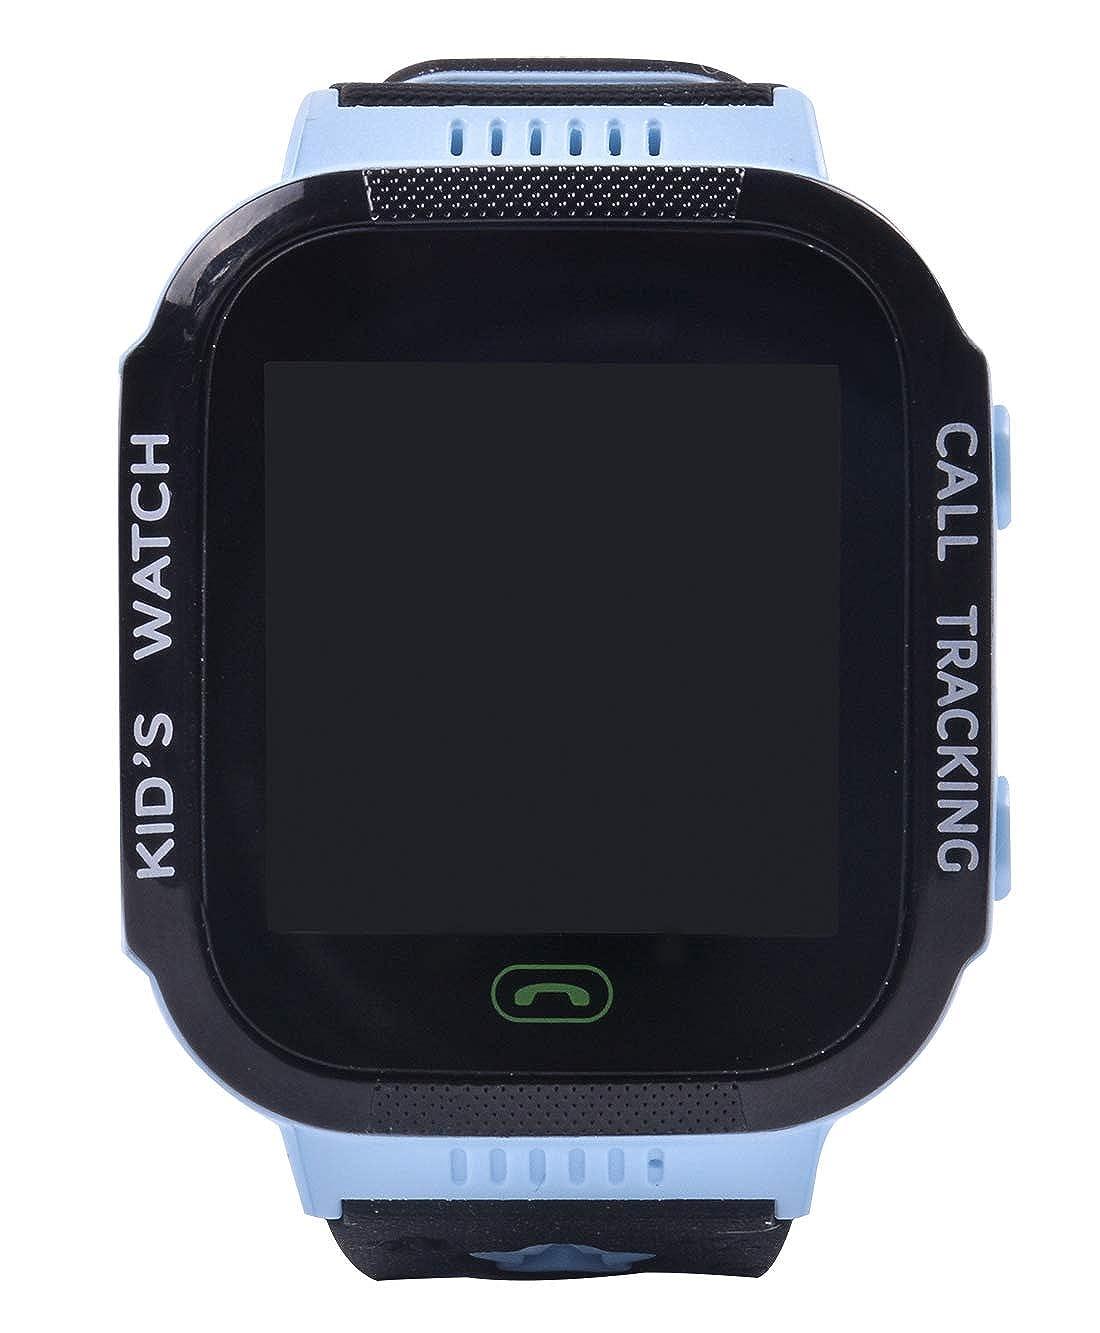 Aivtalk Reloj Inteligente para Niños con GPS Pantalla Táctil SOS Compatible con iOS Despertador Azul: Amazon.es: Relojes